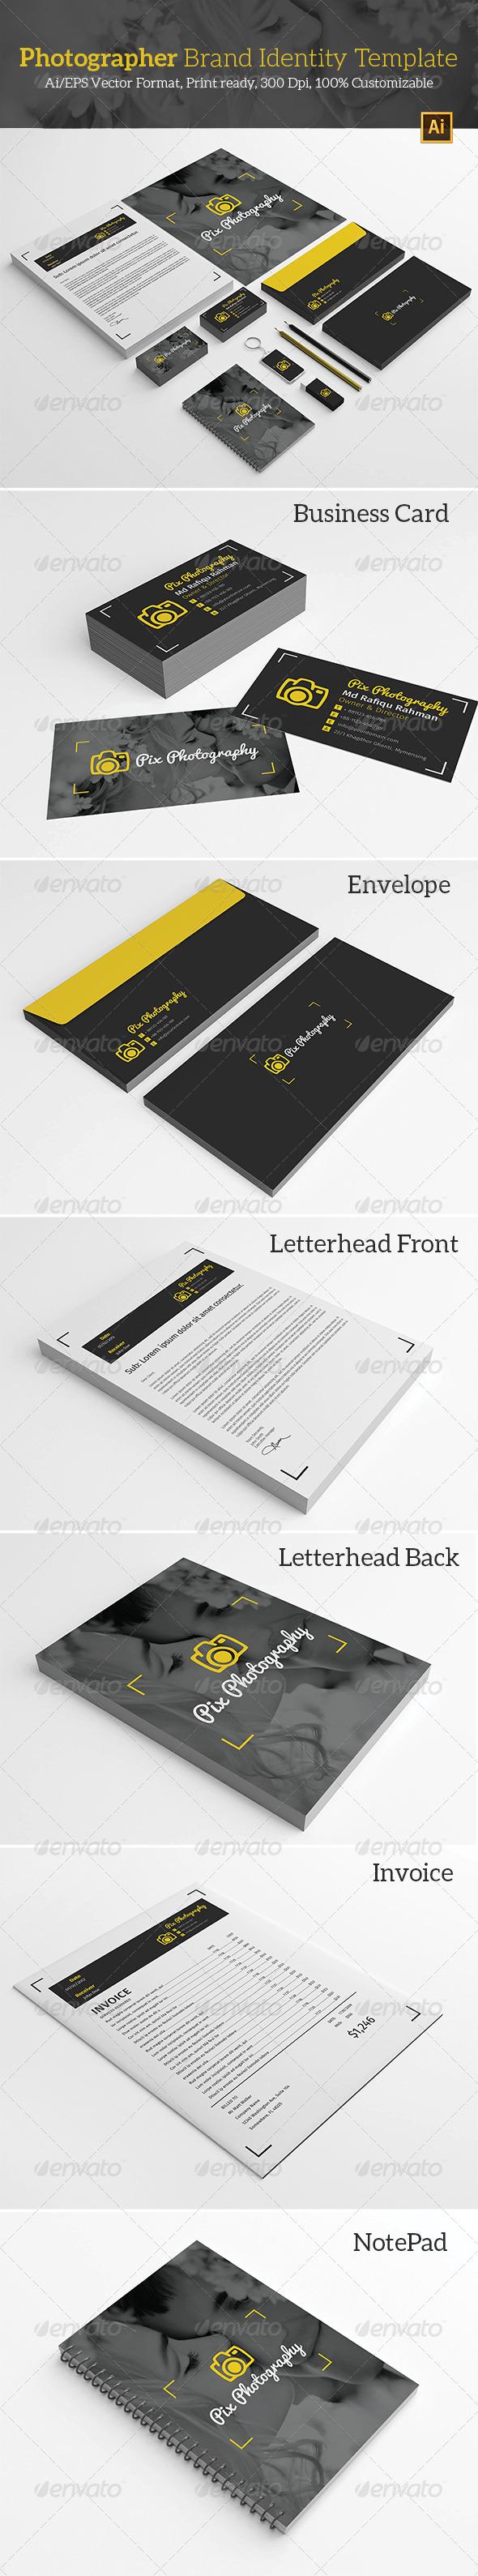 Photographer Brand Identity Template  - Stationery Print Templates